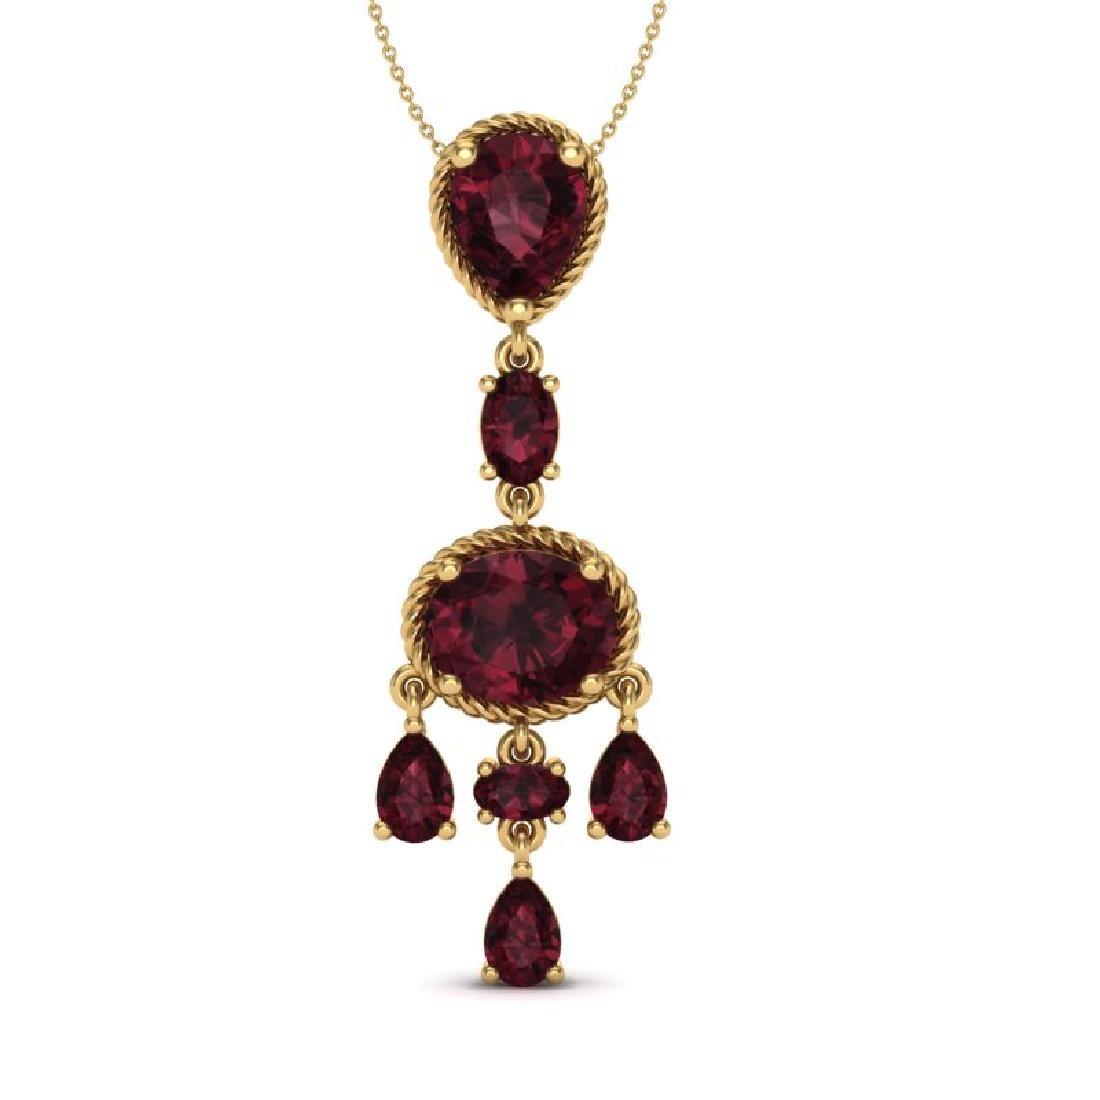 8 CTW Garnet Necklace Designer Vintage 10K Yellow Gold